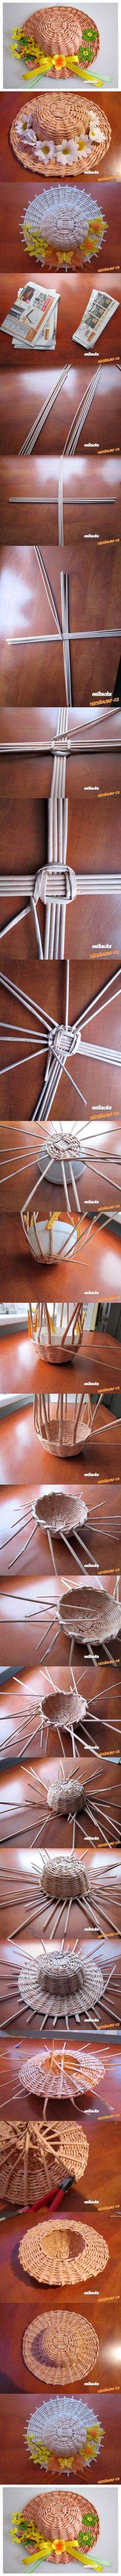 DIY Woven Paper Decorative Hat 2